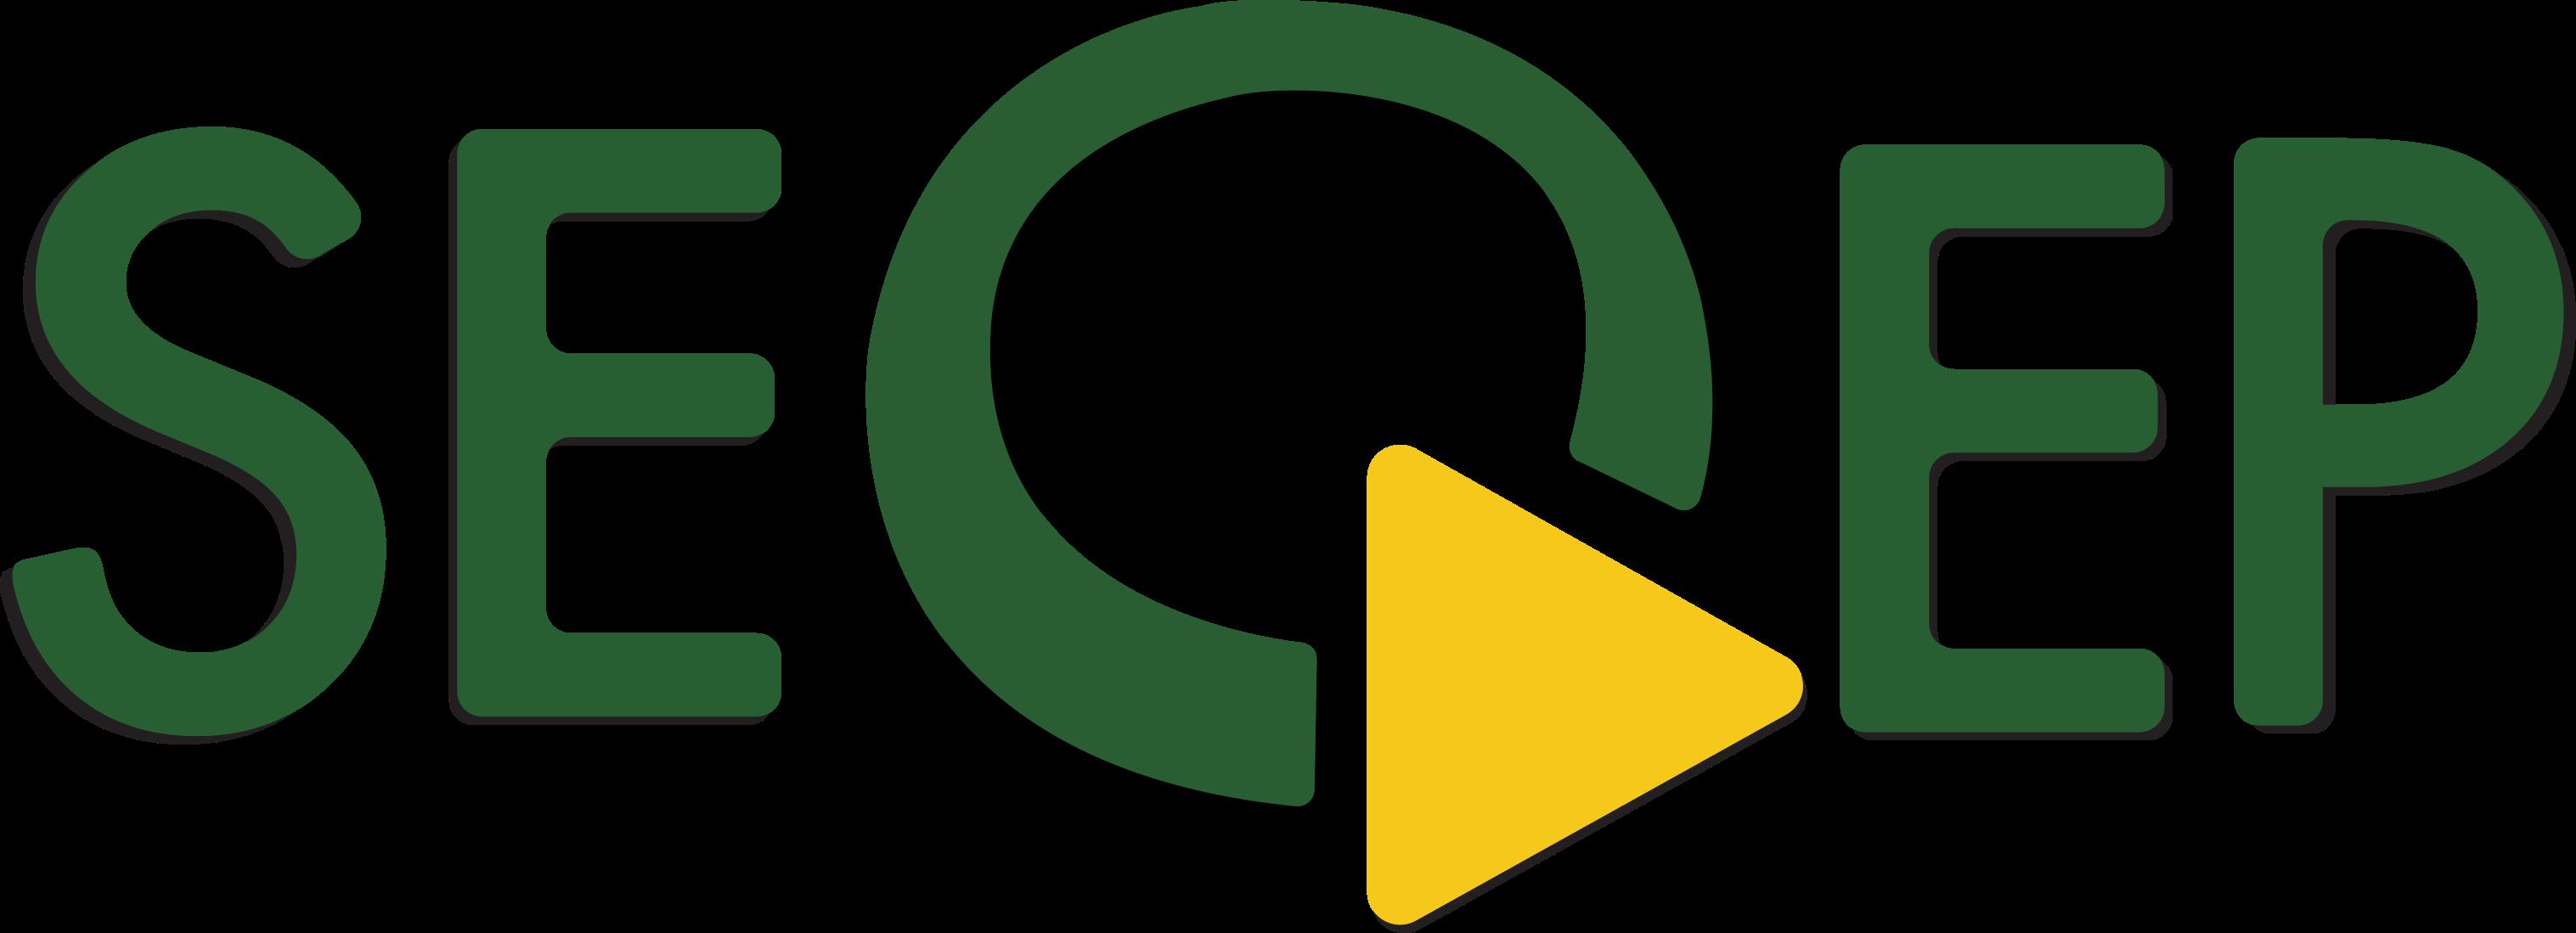 Logo seqep